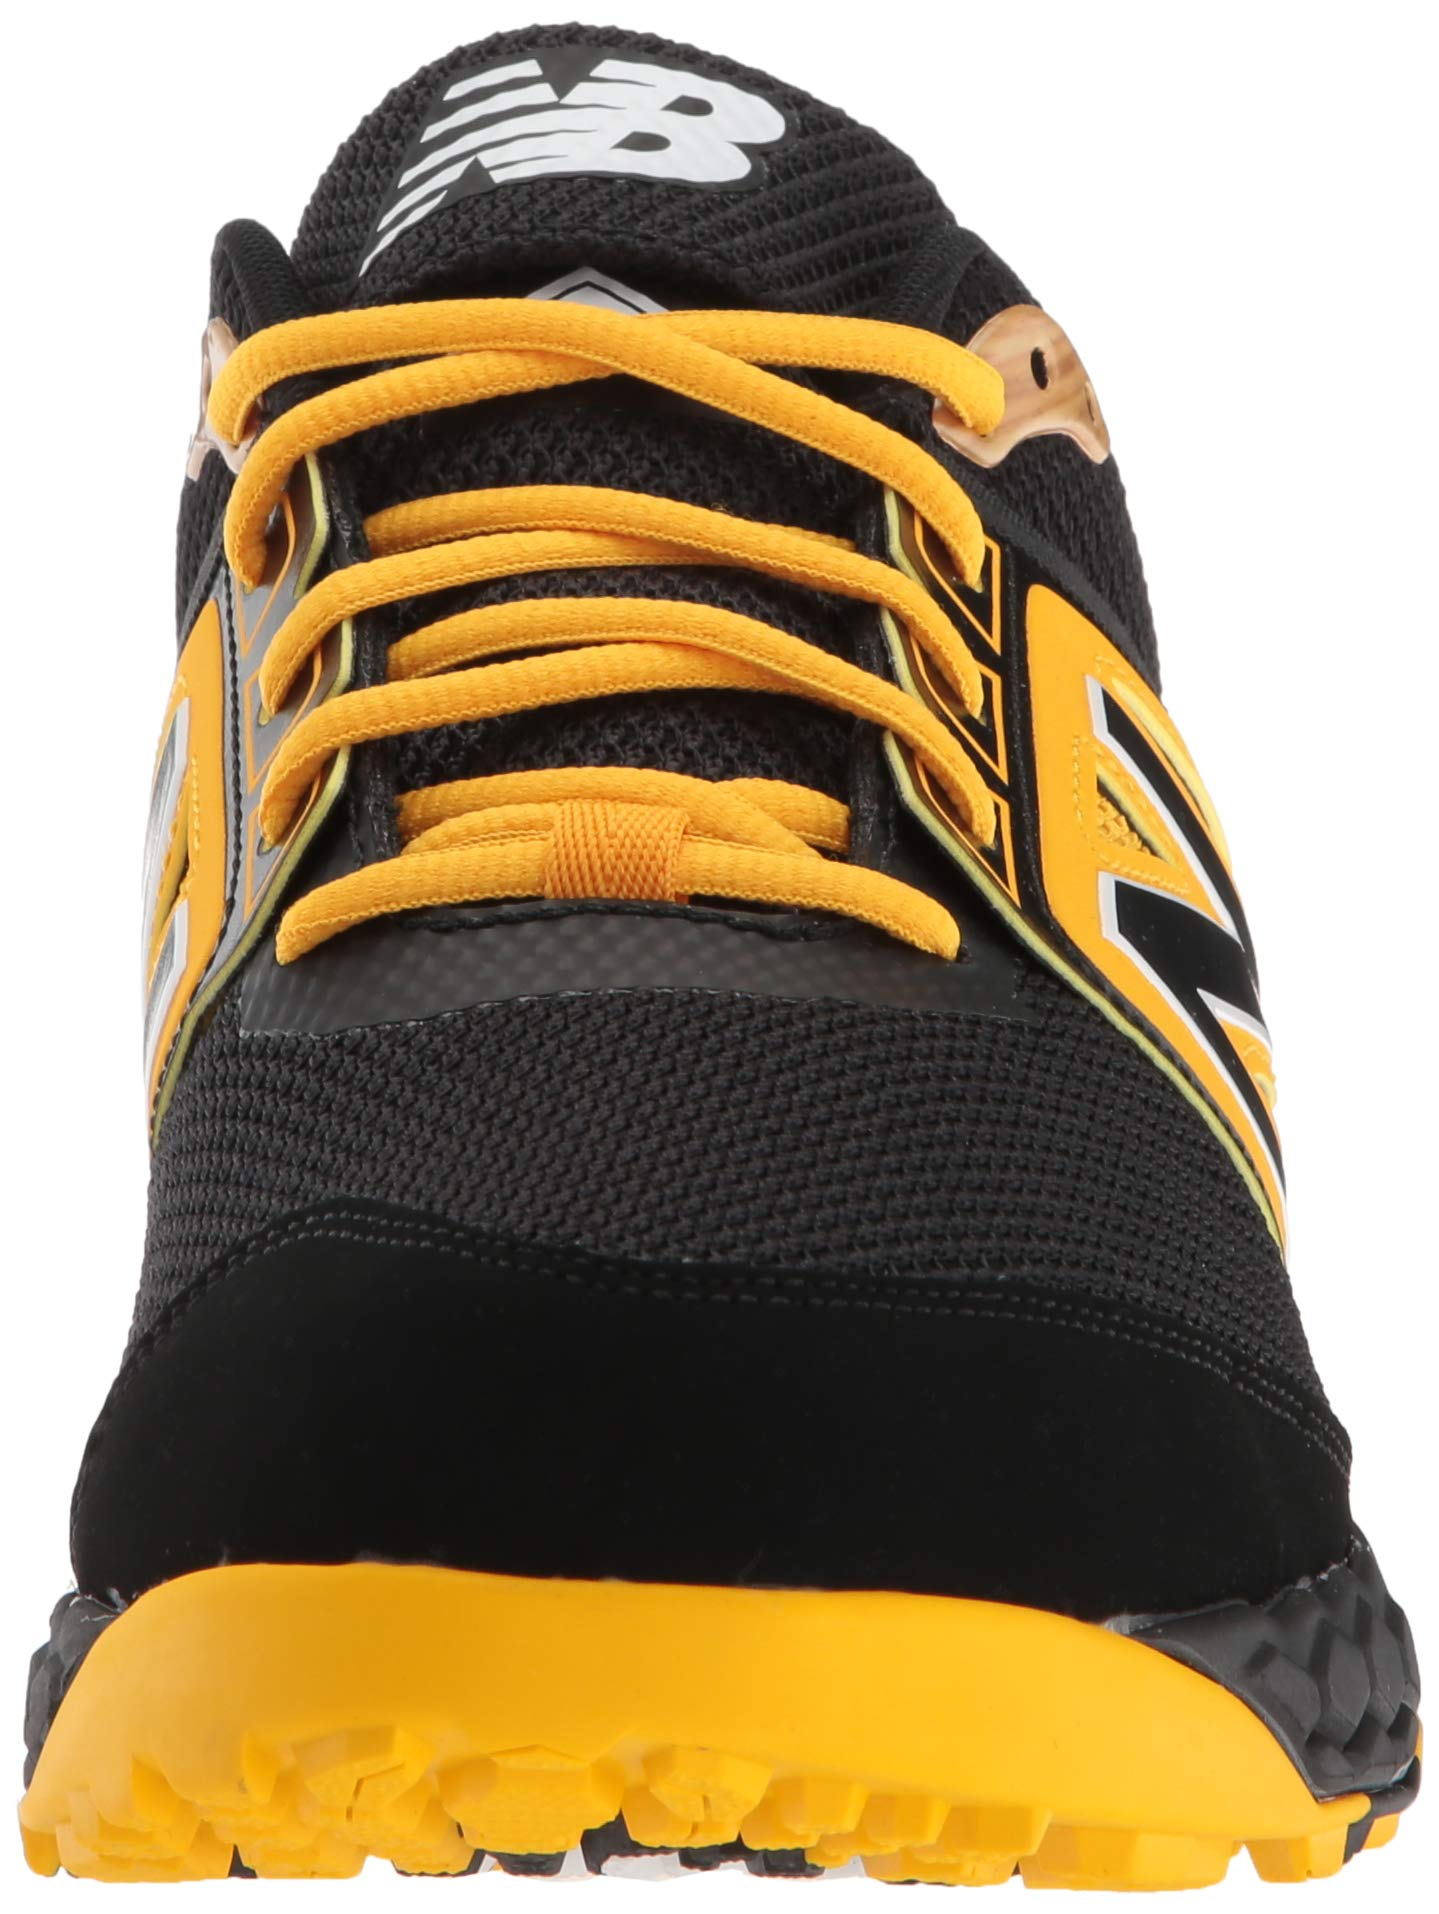 New Balance Men's 3000v4 Turf Baseball Shoe, Black/Yellow, 5 D US by New Balance (Image #4)